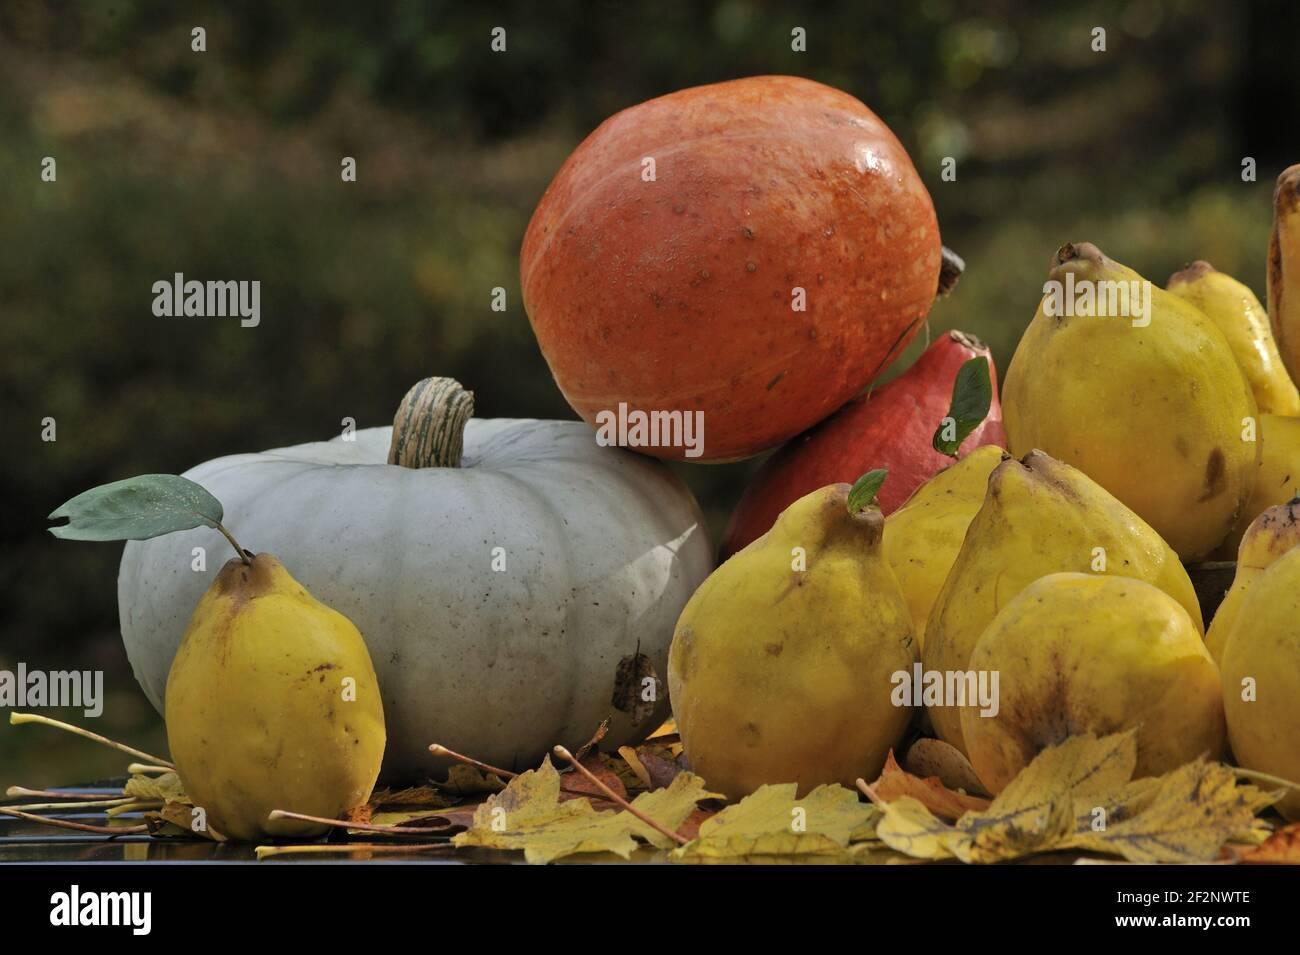 reife Quitten und Kürbisse | ripe quinces and pumpkins Stock Photo